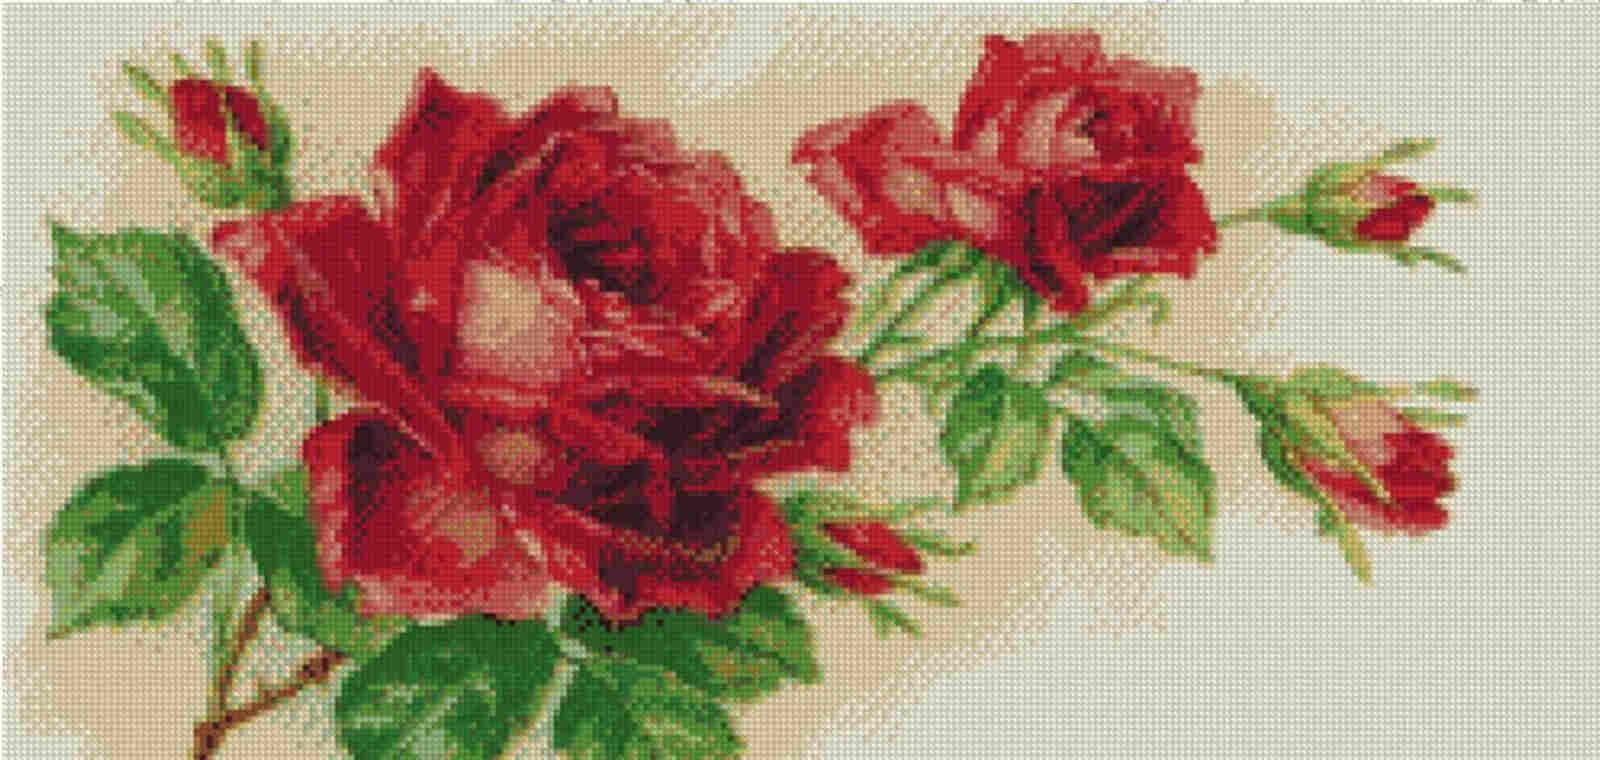 Free Cross Stitch Charts - Red Rose